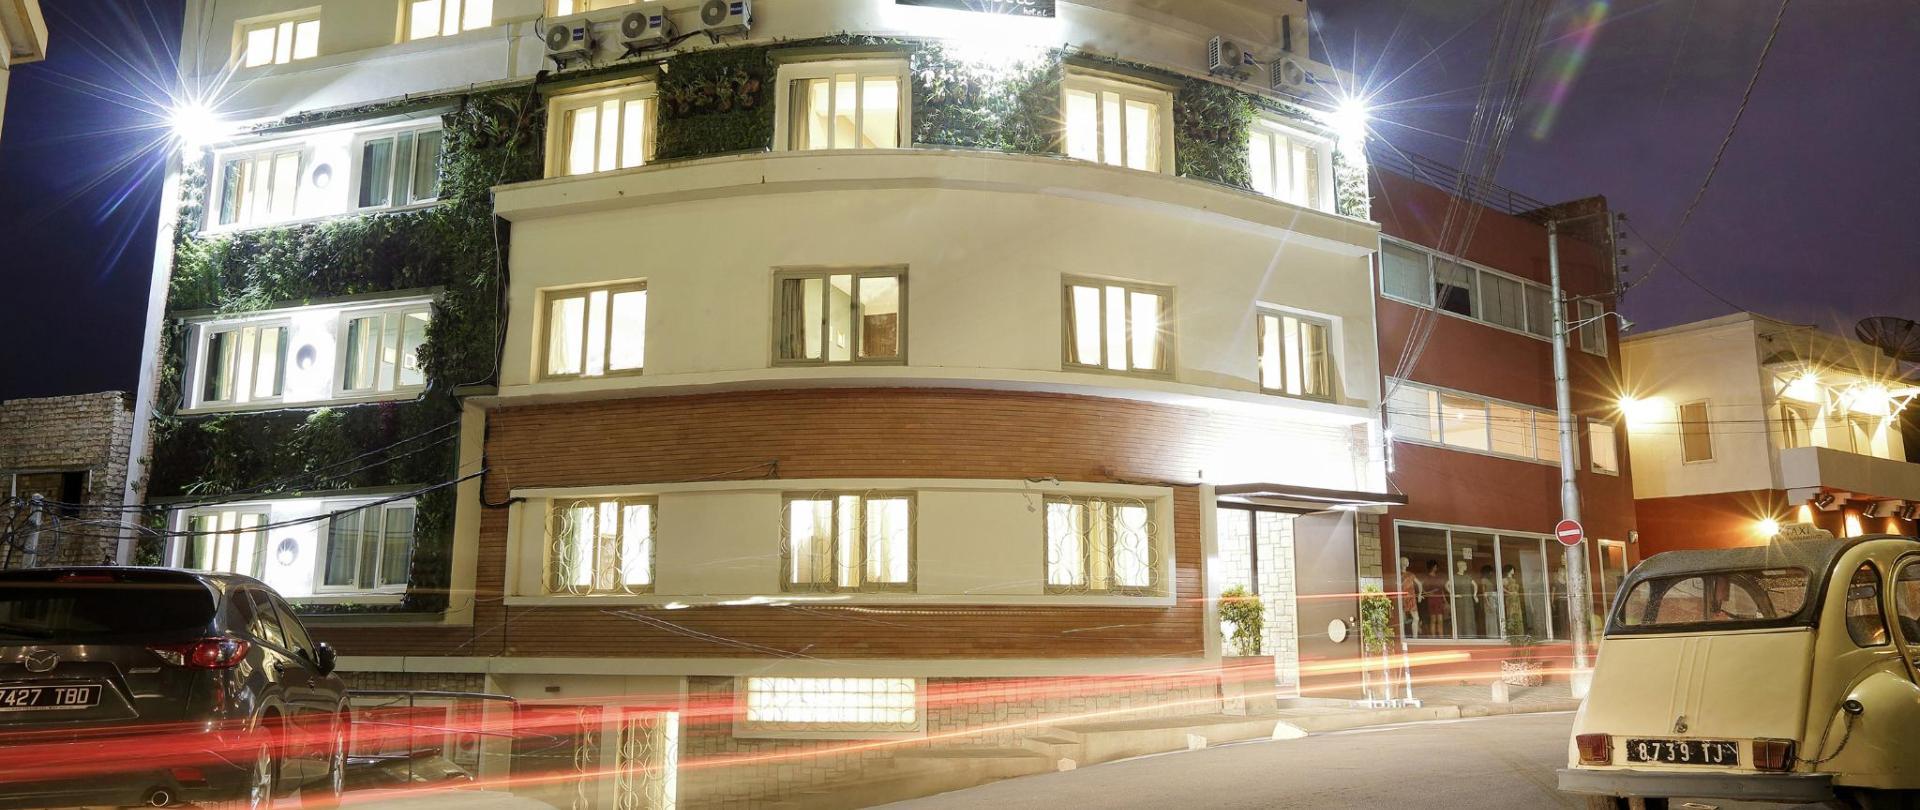 0054_Hotel La Villette Isoraka_17-10-13.jpg